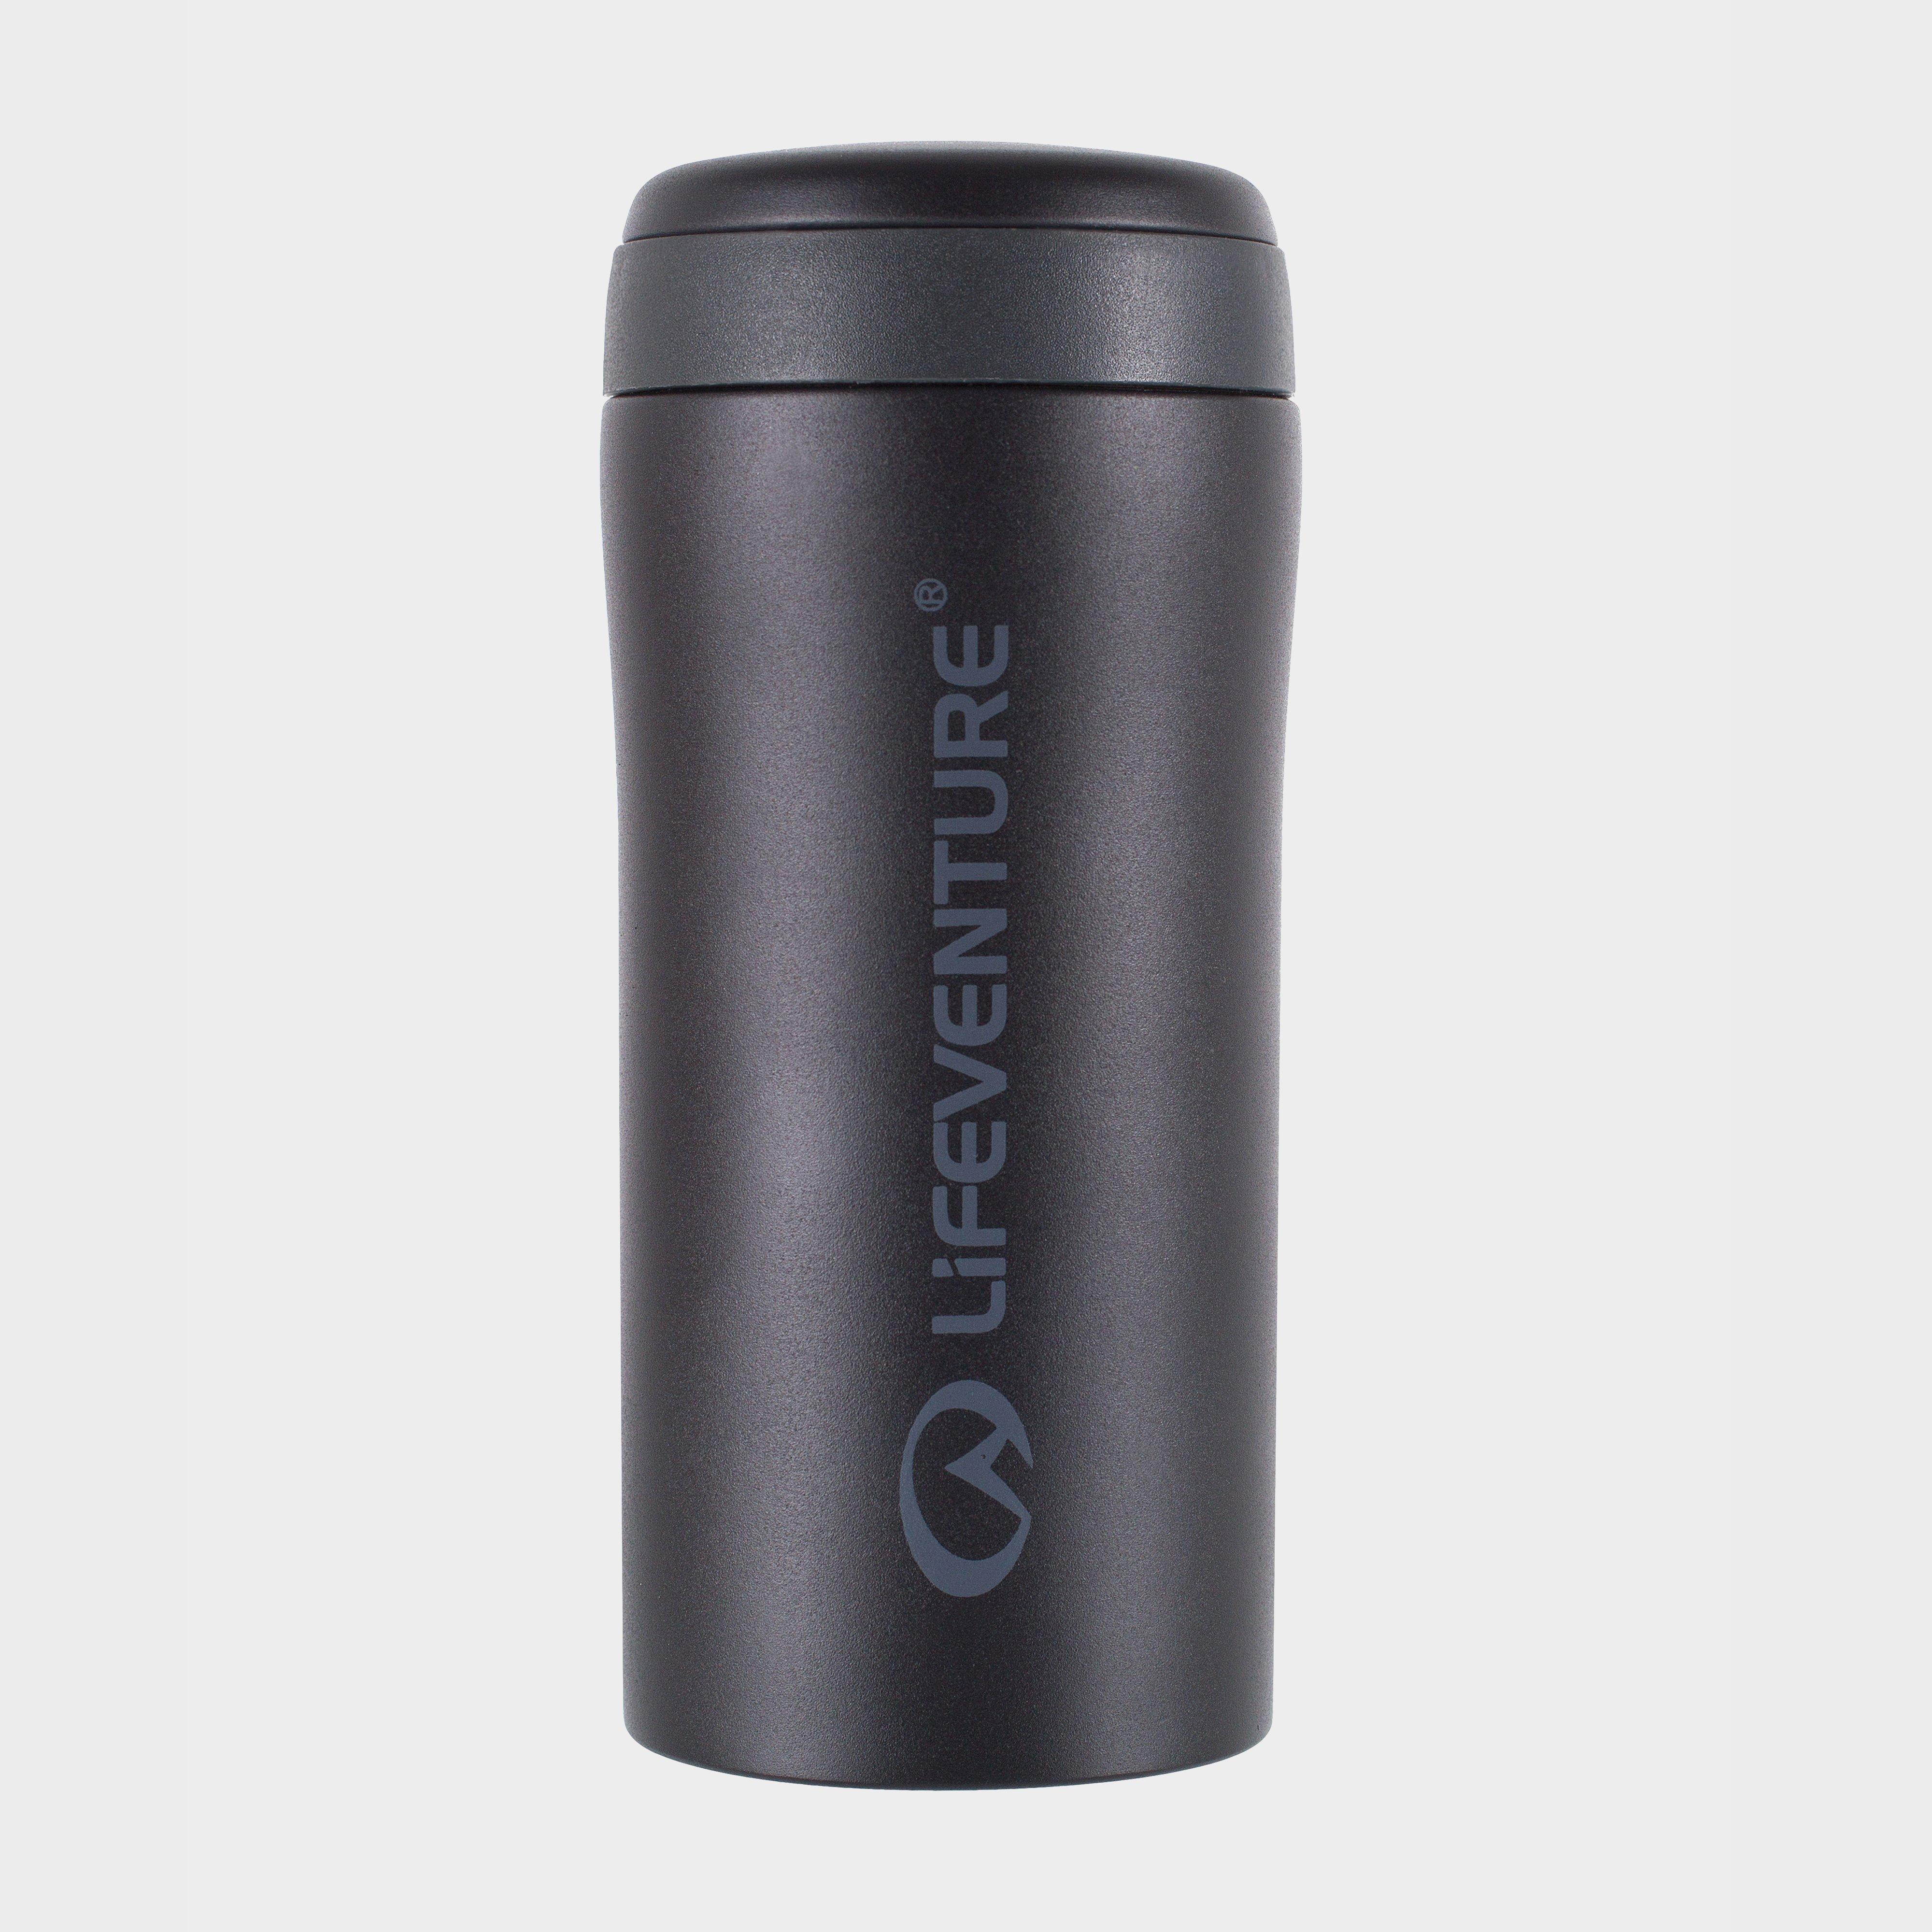 Lifeventure Lifeventure Thermal Mug - Black, Black